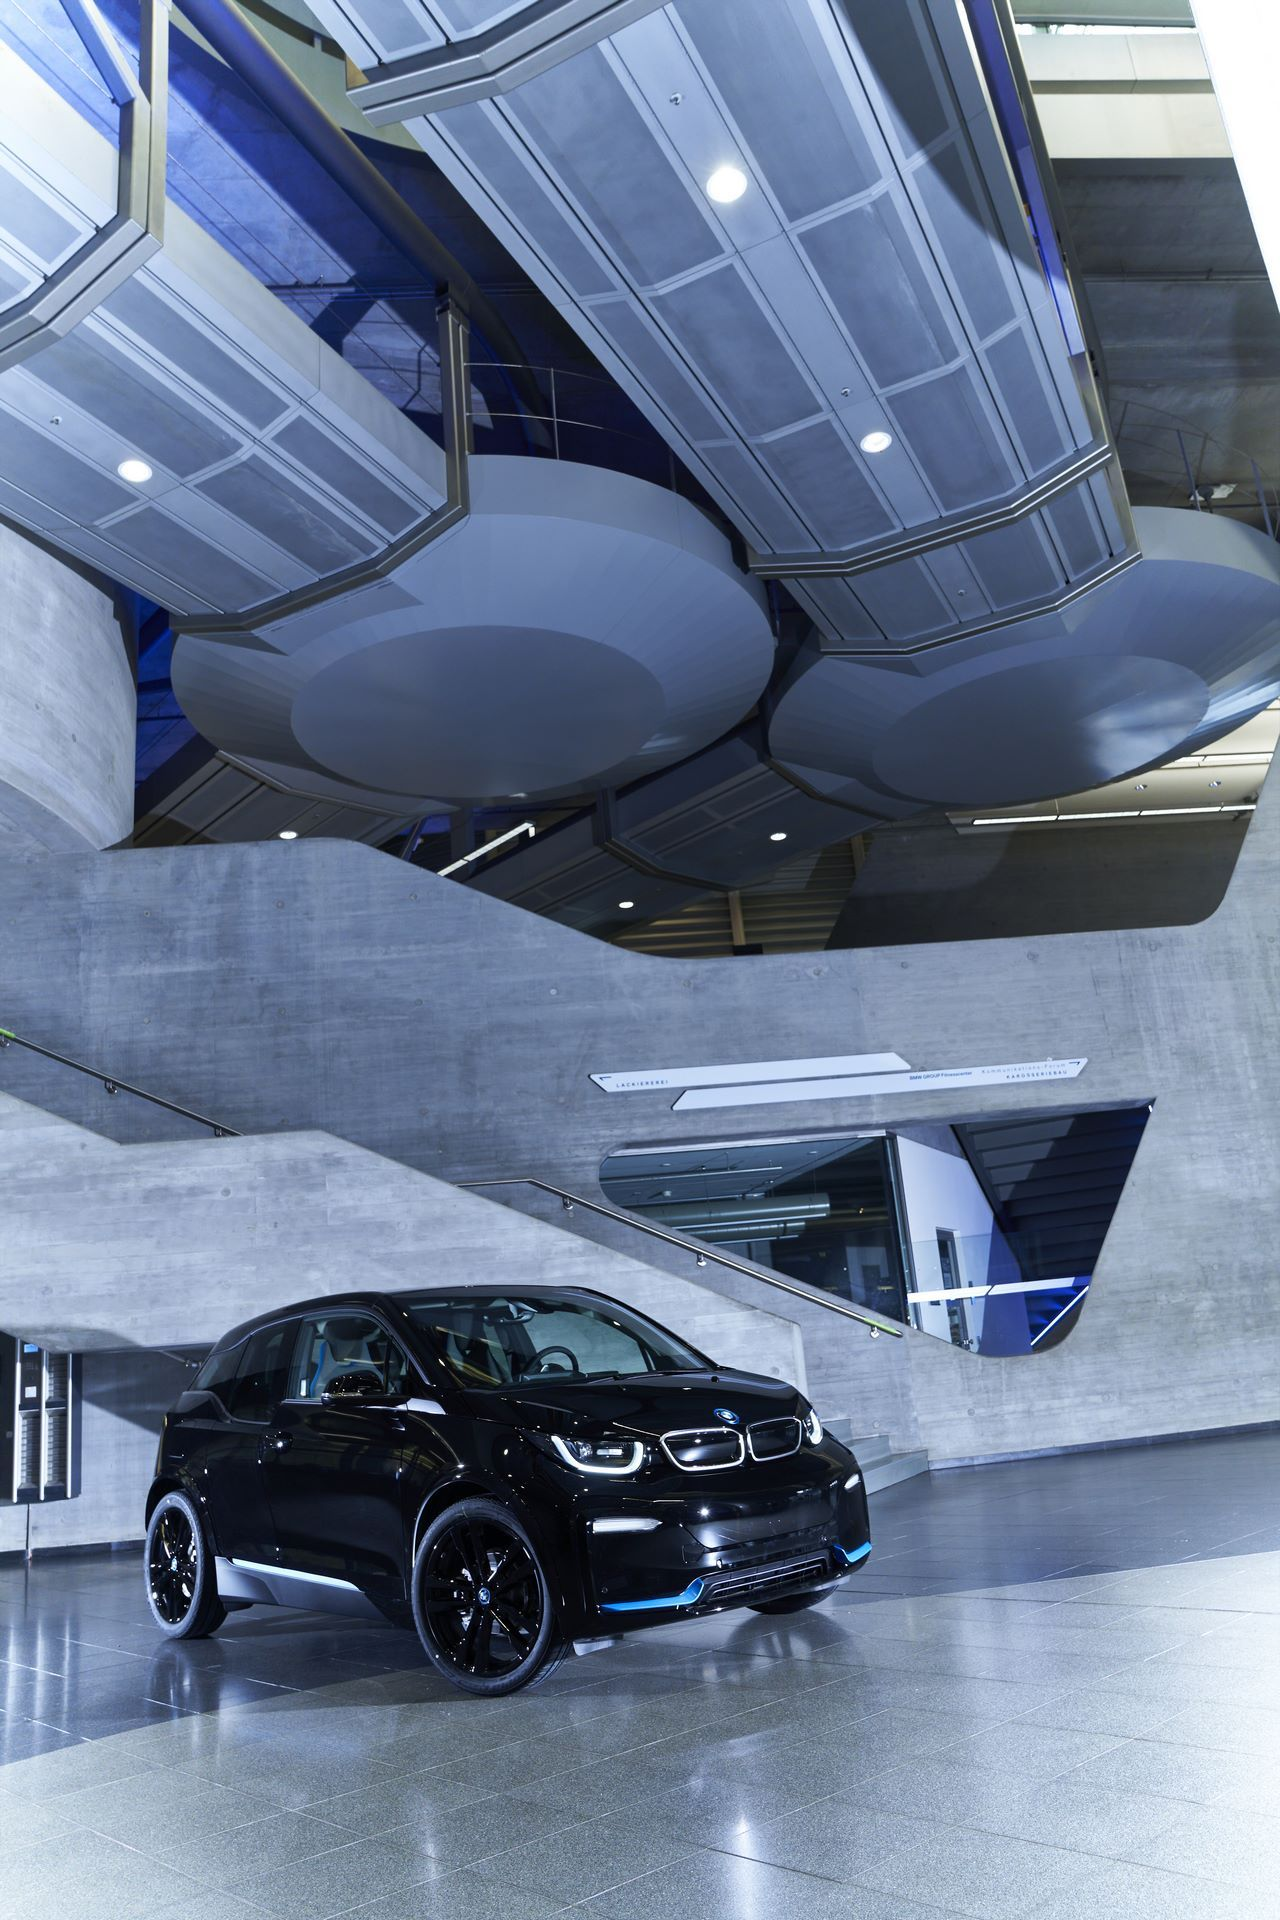 BMW-i8-plant-production-79